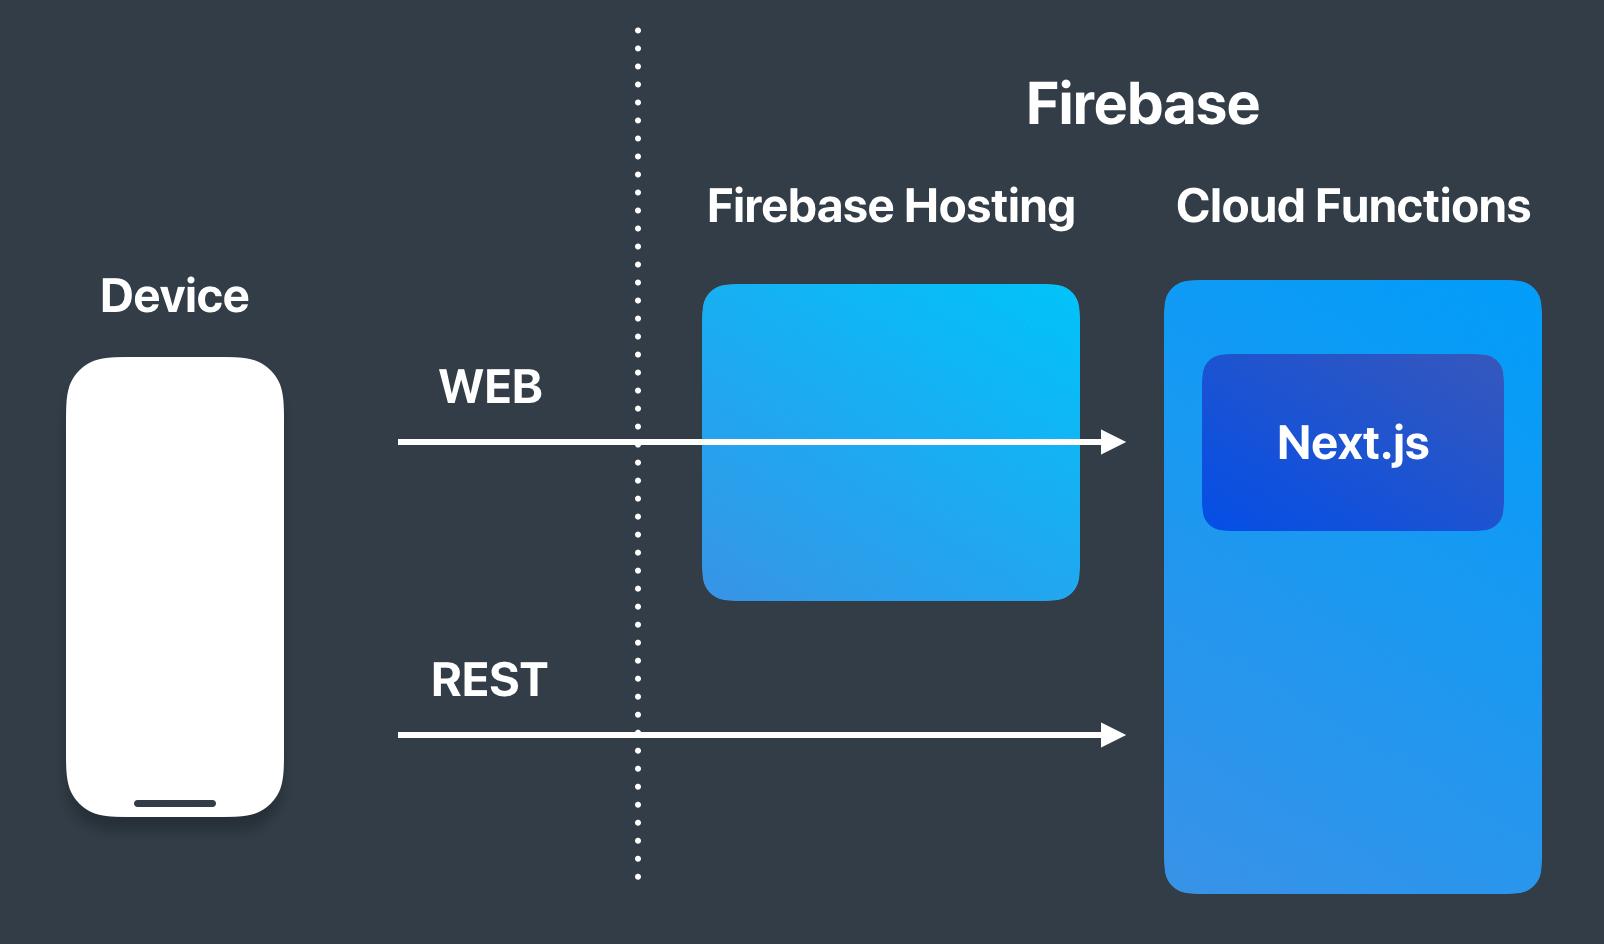 Next.js on Firebase Hosting, Cloud Functions